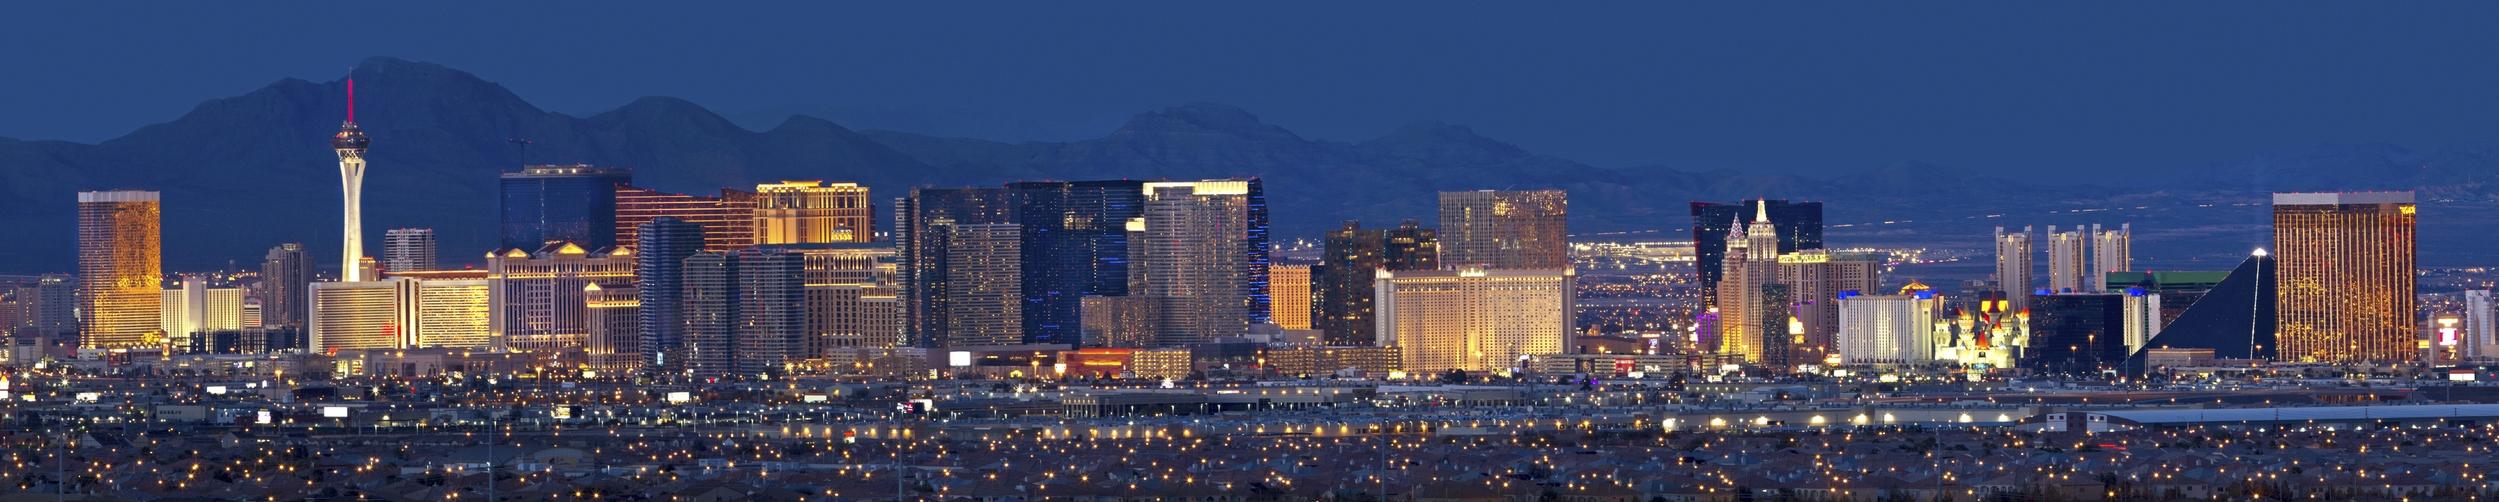 Top Las Vegas Advertising Marketing and Web Designers